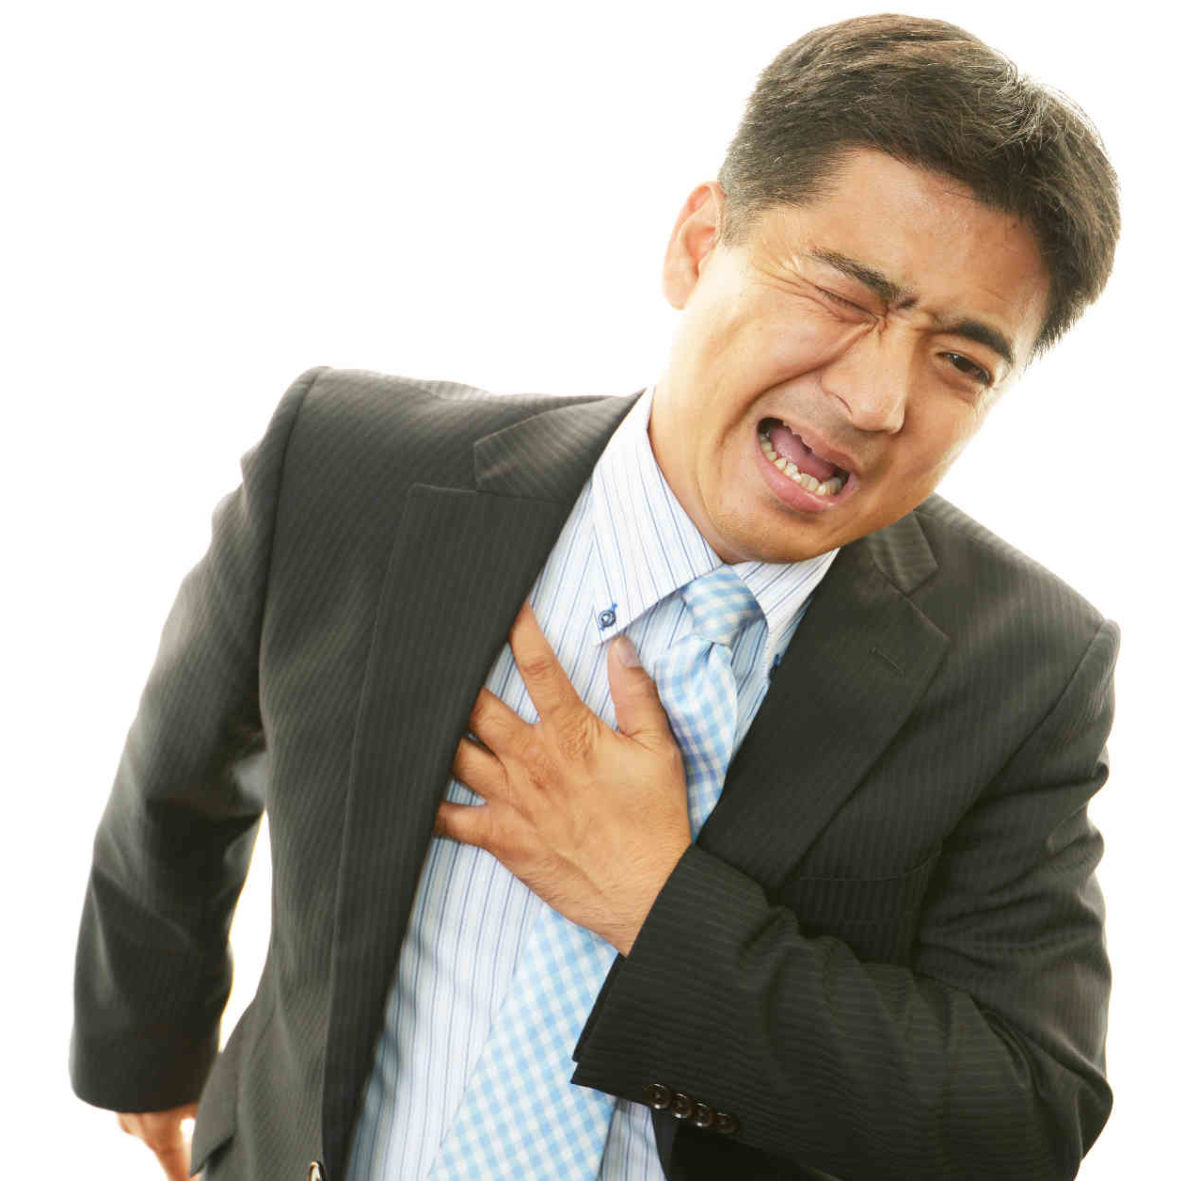 bigstock-Man-having-a-chest-pain-50671724-e1489427428388-1200x1181.jpg